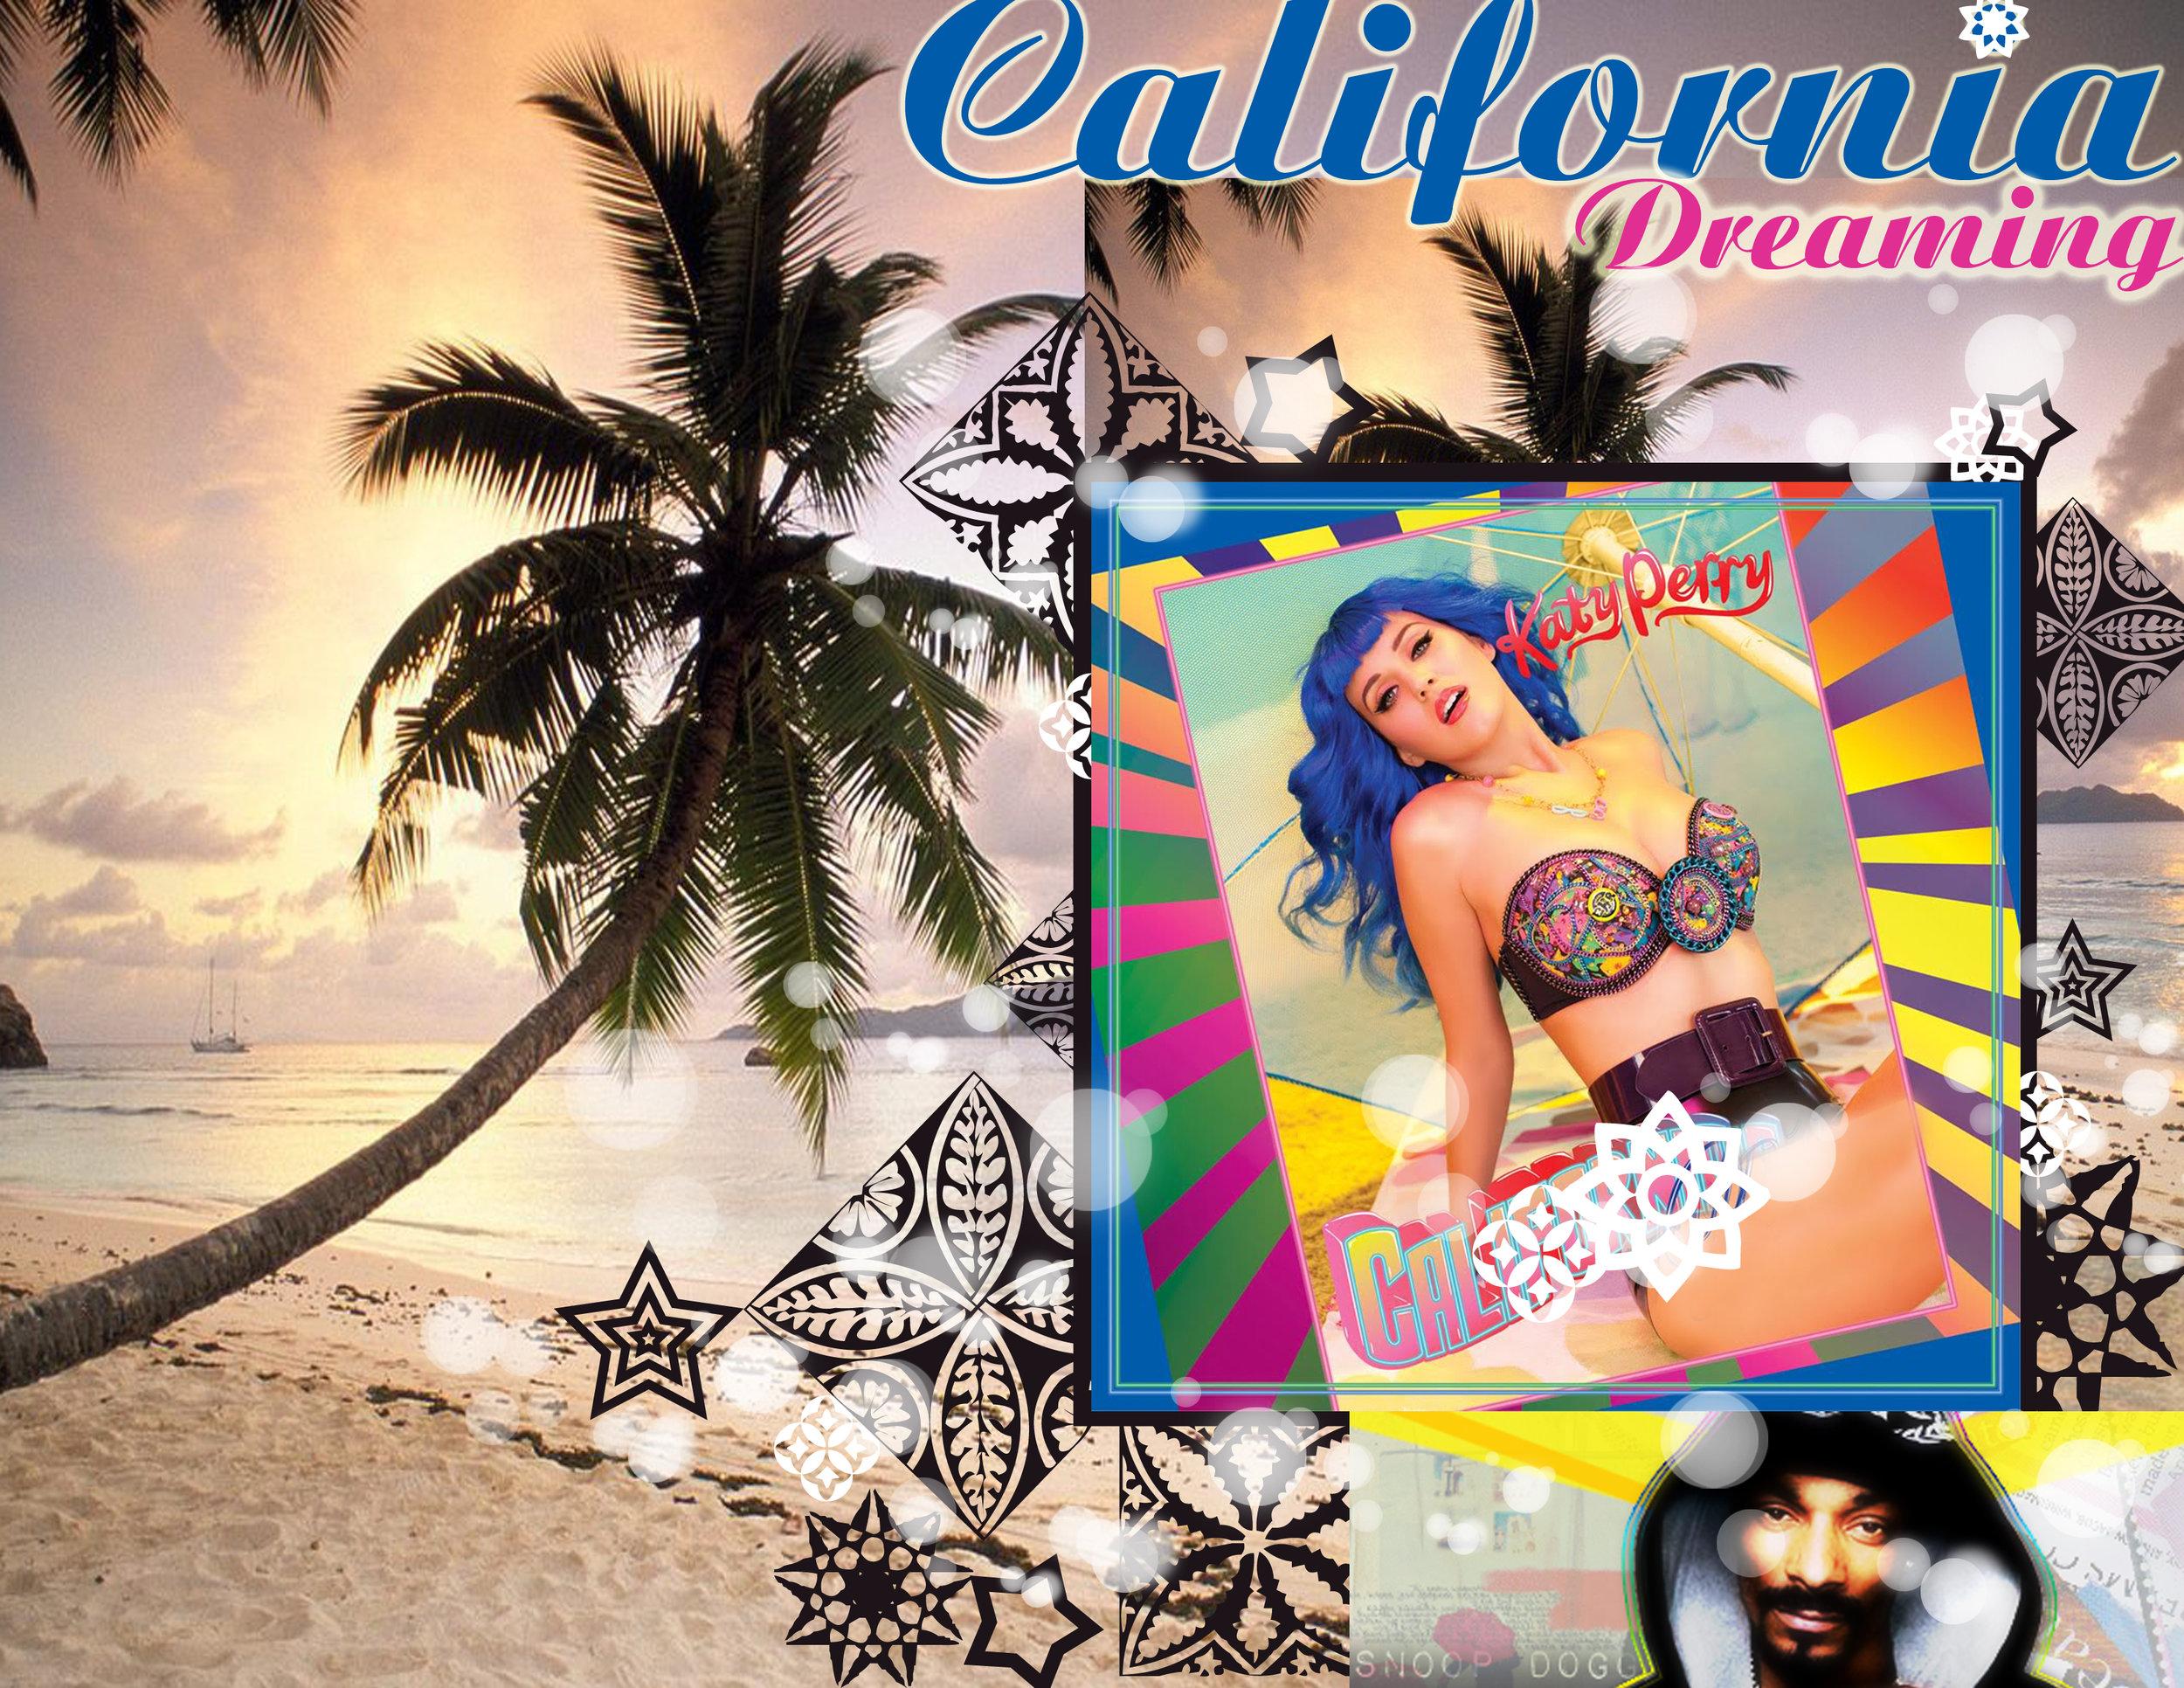 California Dreaming mood page.jpg